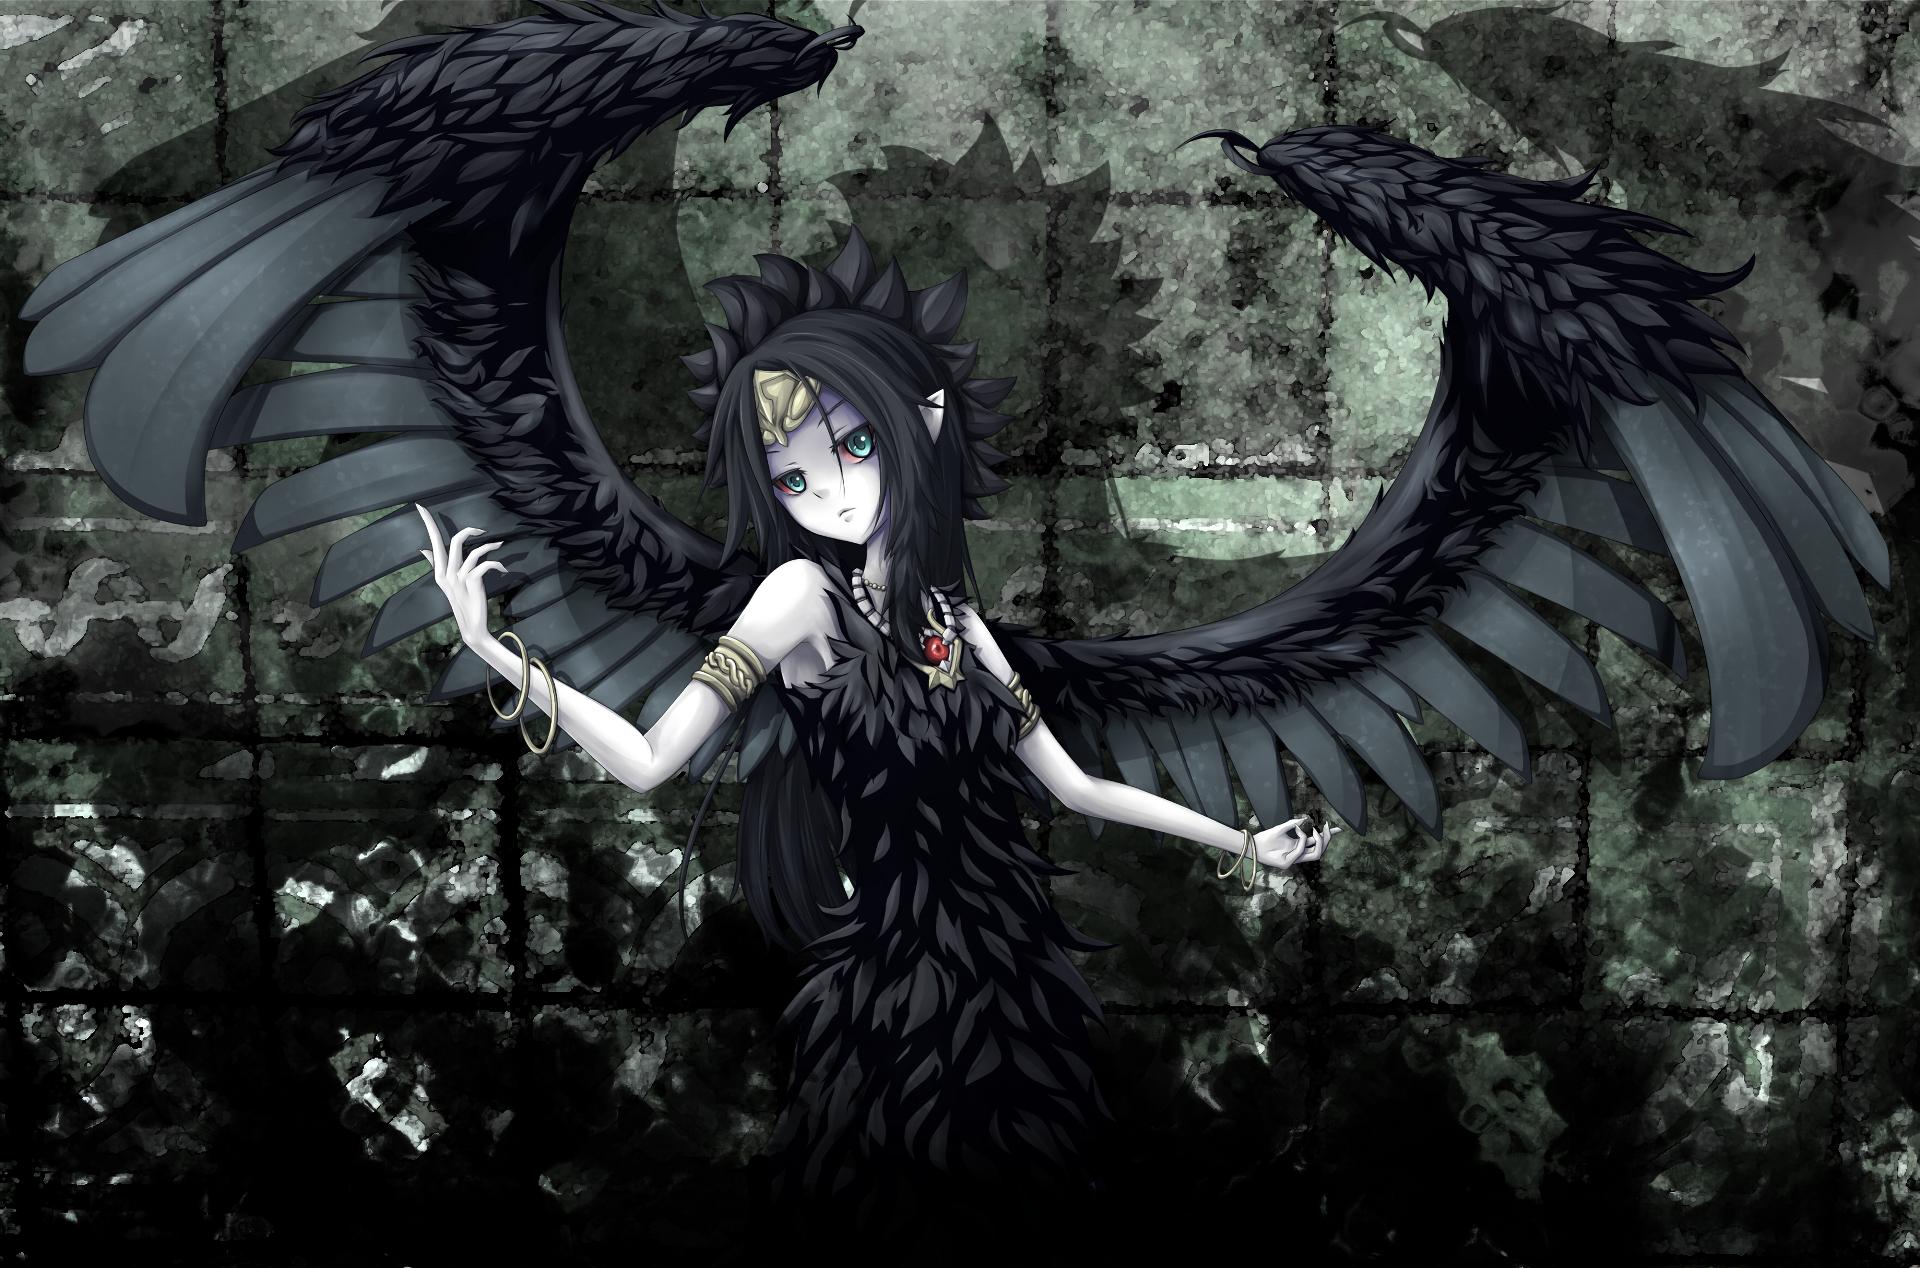 Anime dark angel hd wallpaper background image - Dark angel anime wallpaper ...